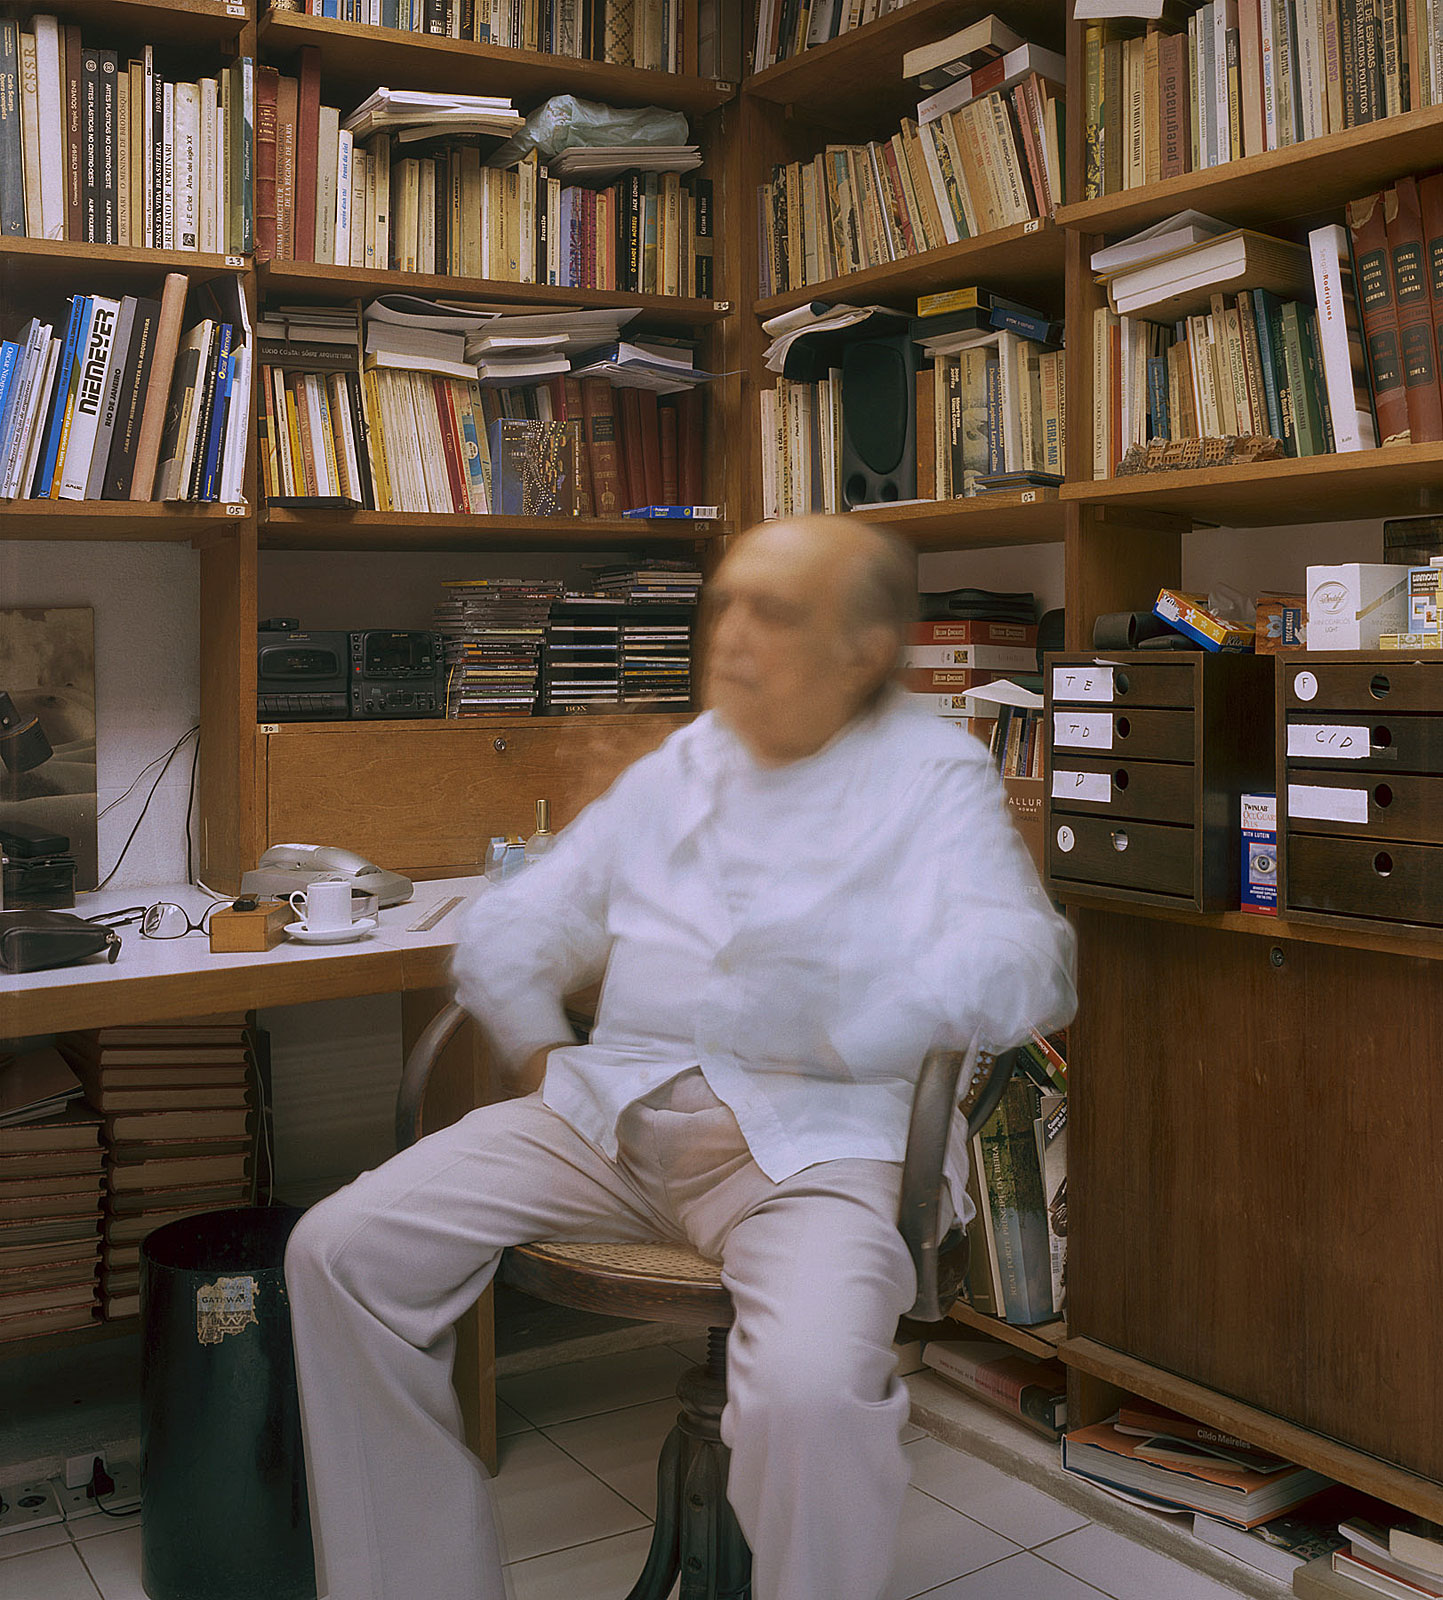 Oscar Niemeyer (13.12 - 13.17 Uhr, 22.10.2003)